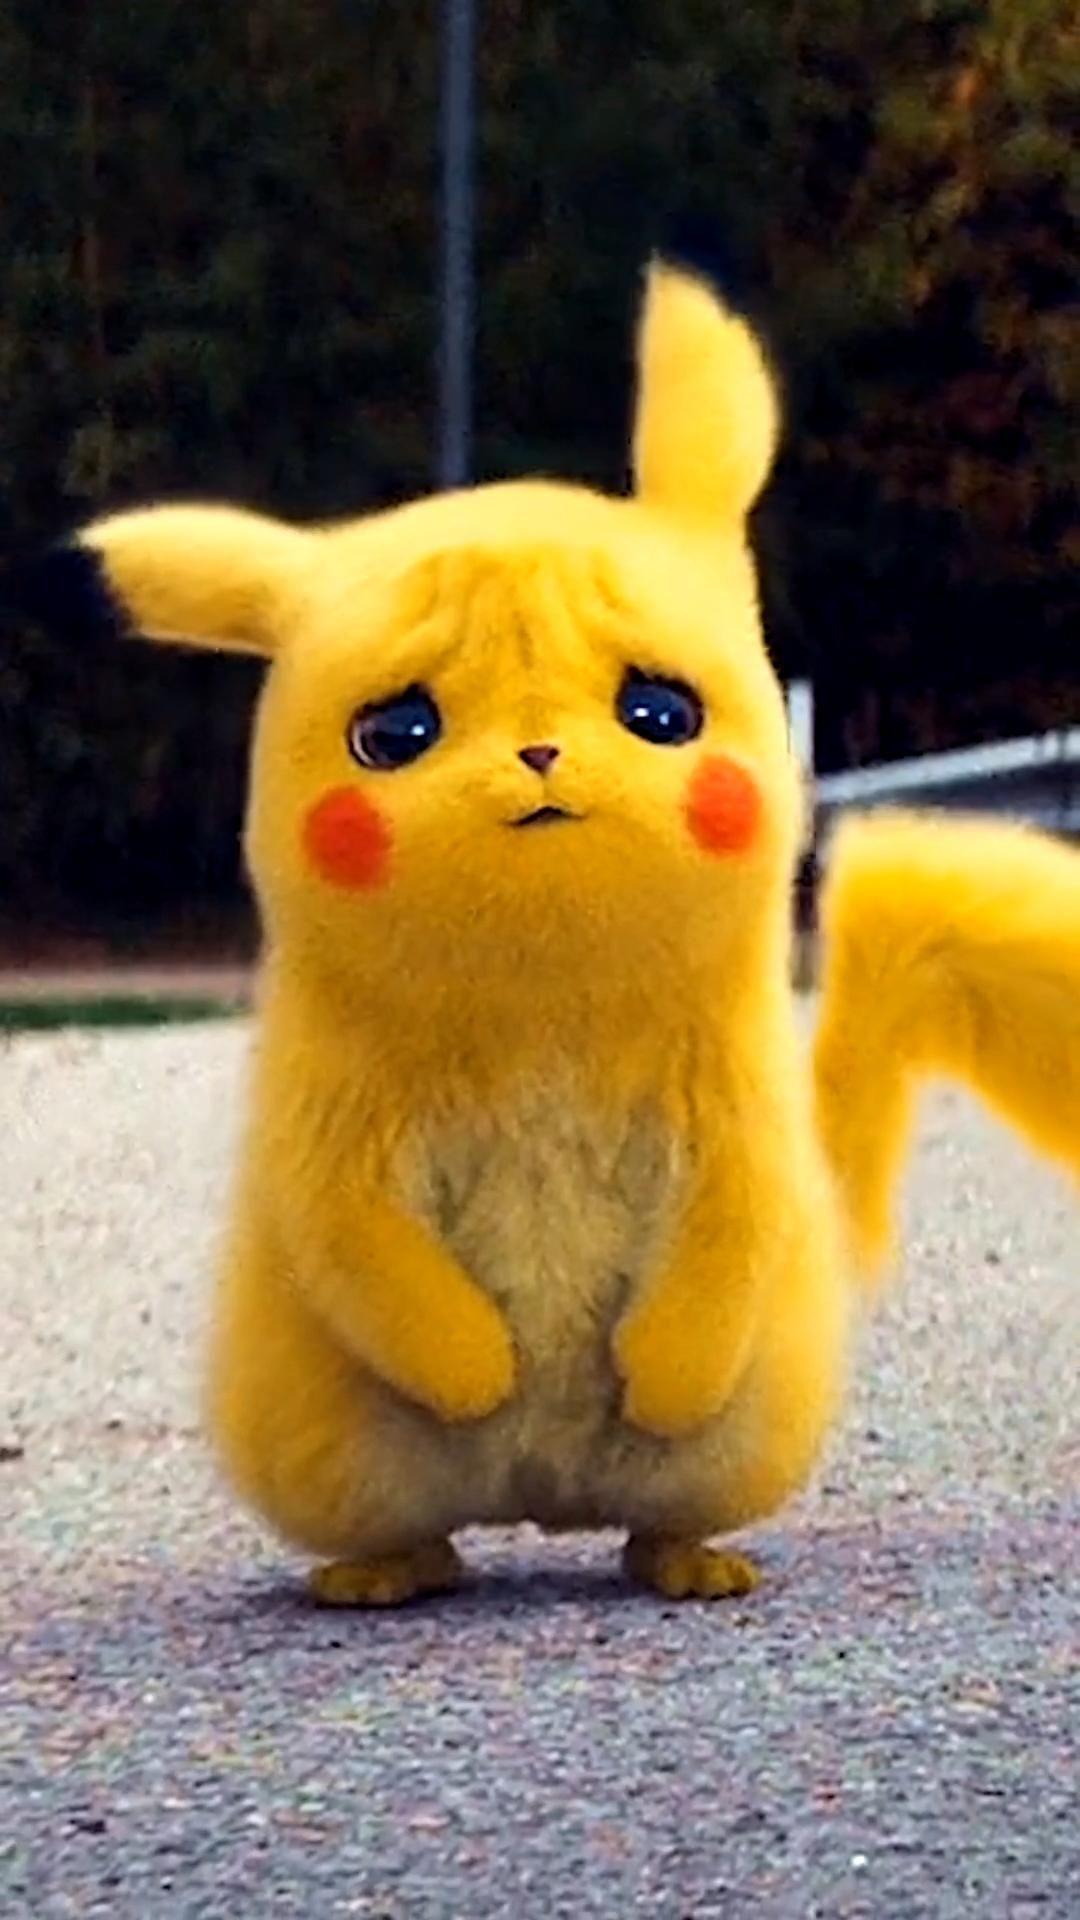 10 cutest Pikachu videos